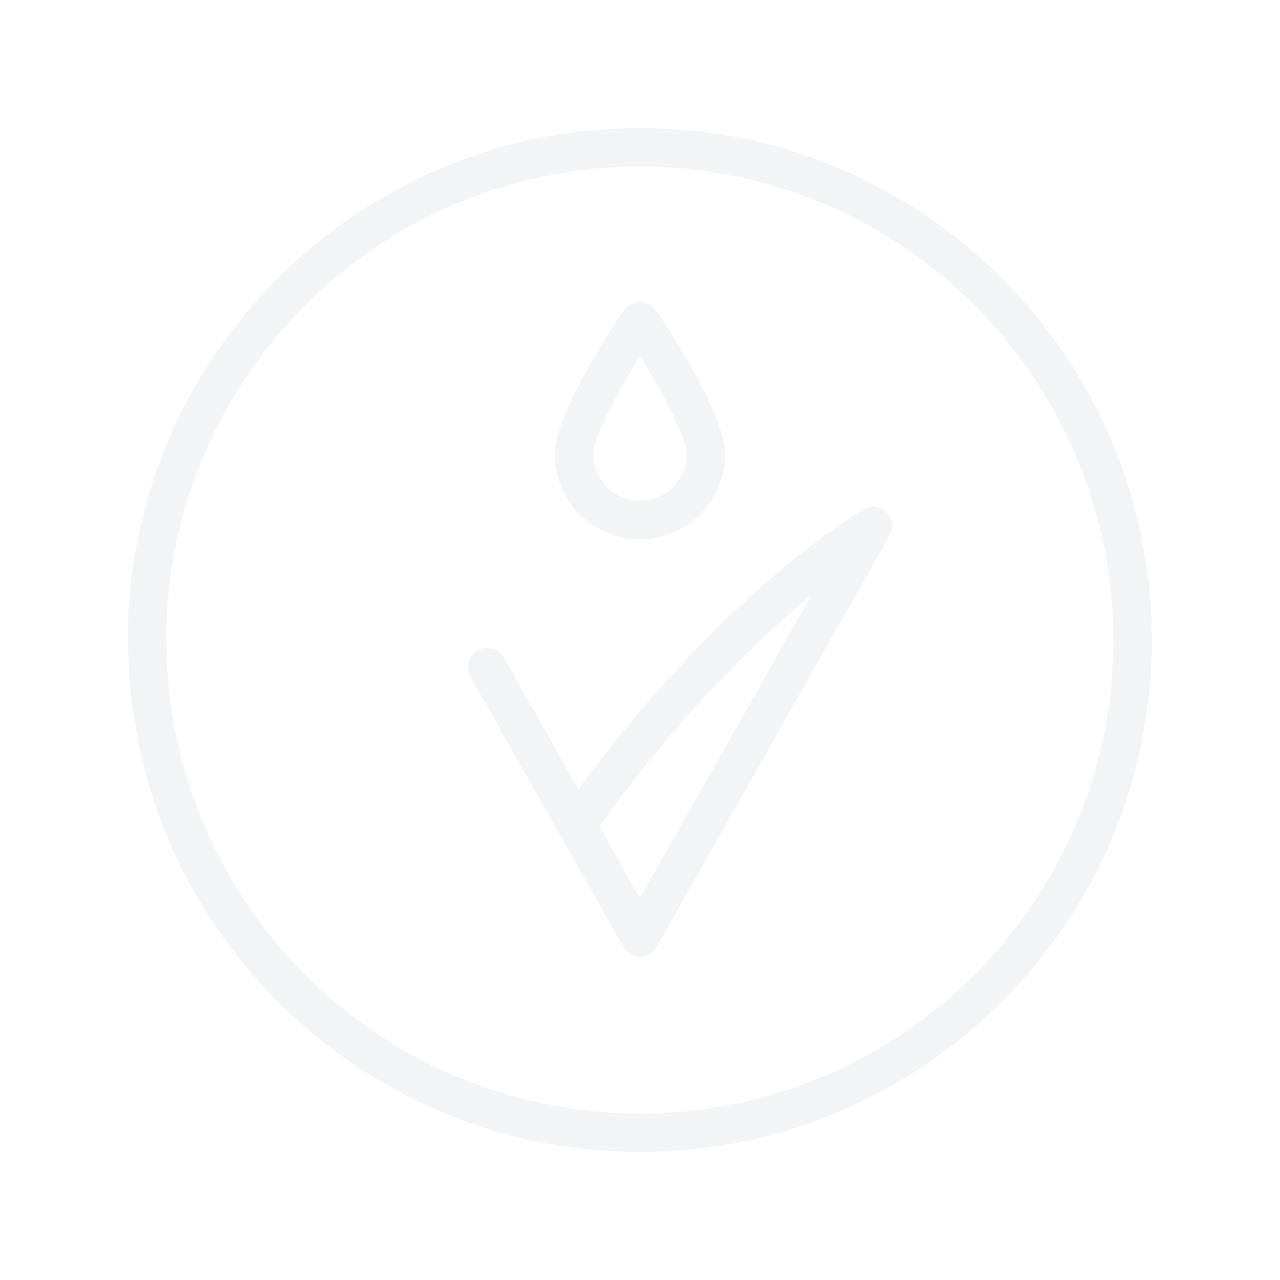 MAYBELLINE Lemonade Craze Eyeshadow Palette 12g